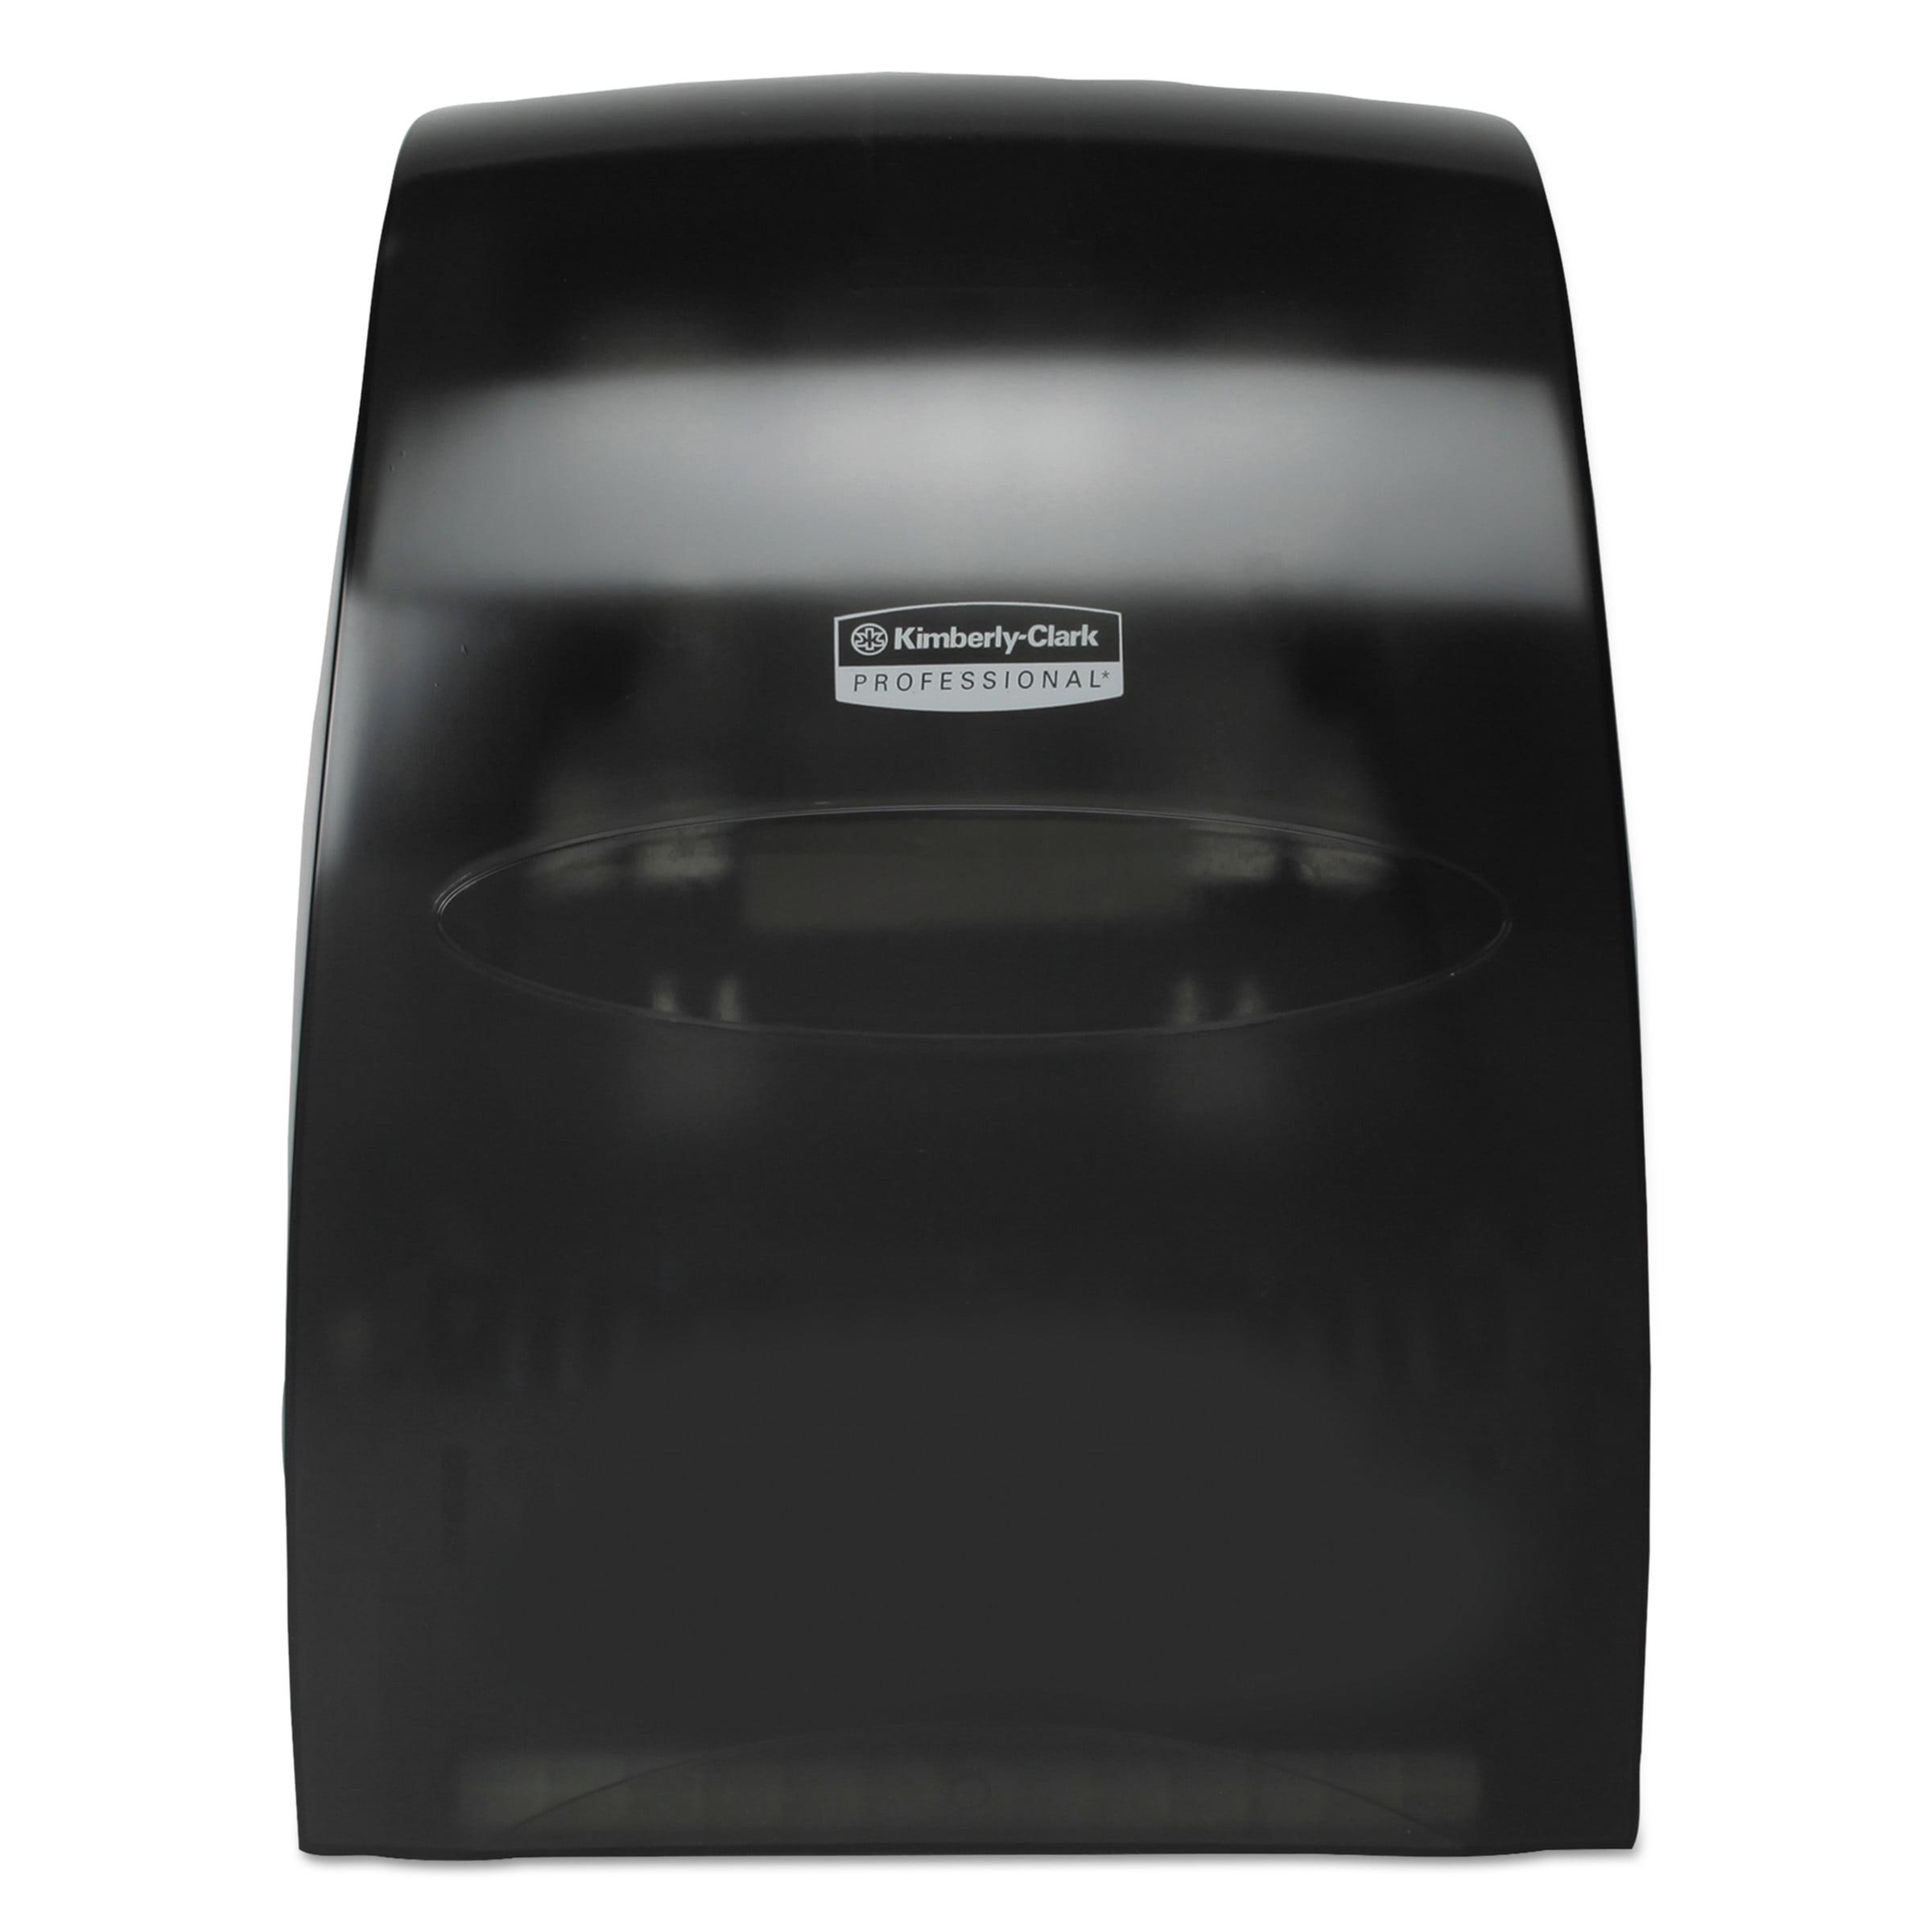 KCC09765 Kimberly-Clark Professional Lev-R-Matic Roll Towel Dispenser